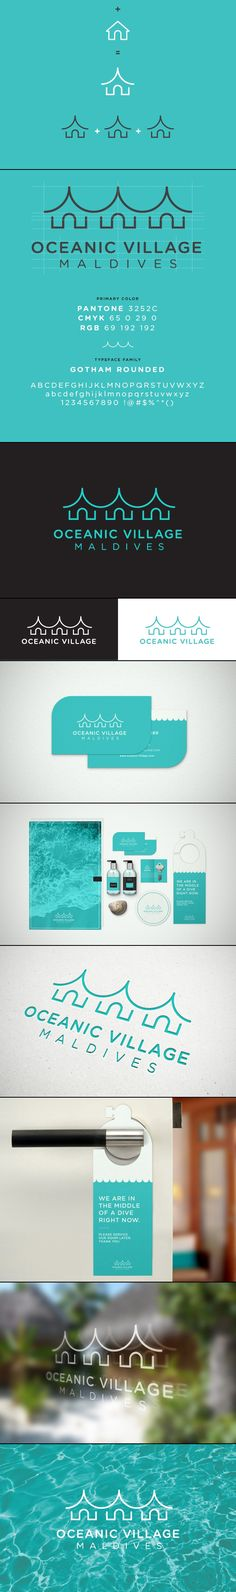 Oceanic Village #Identity #branding #logotipos